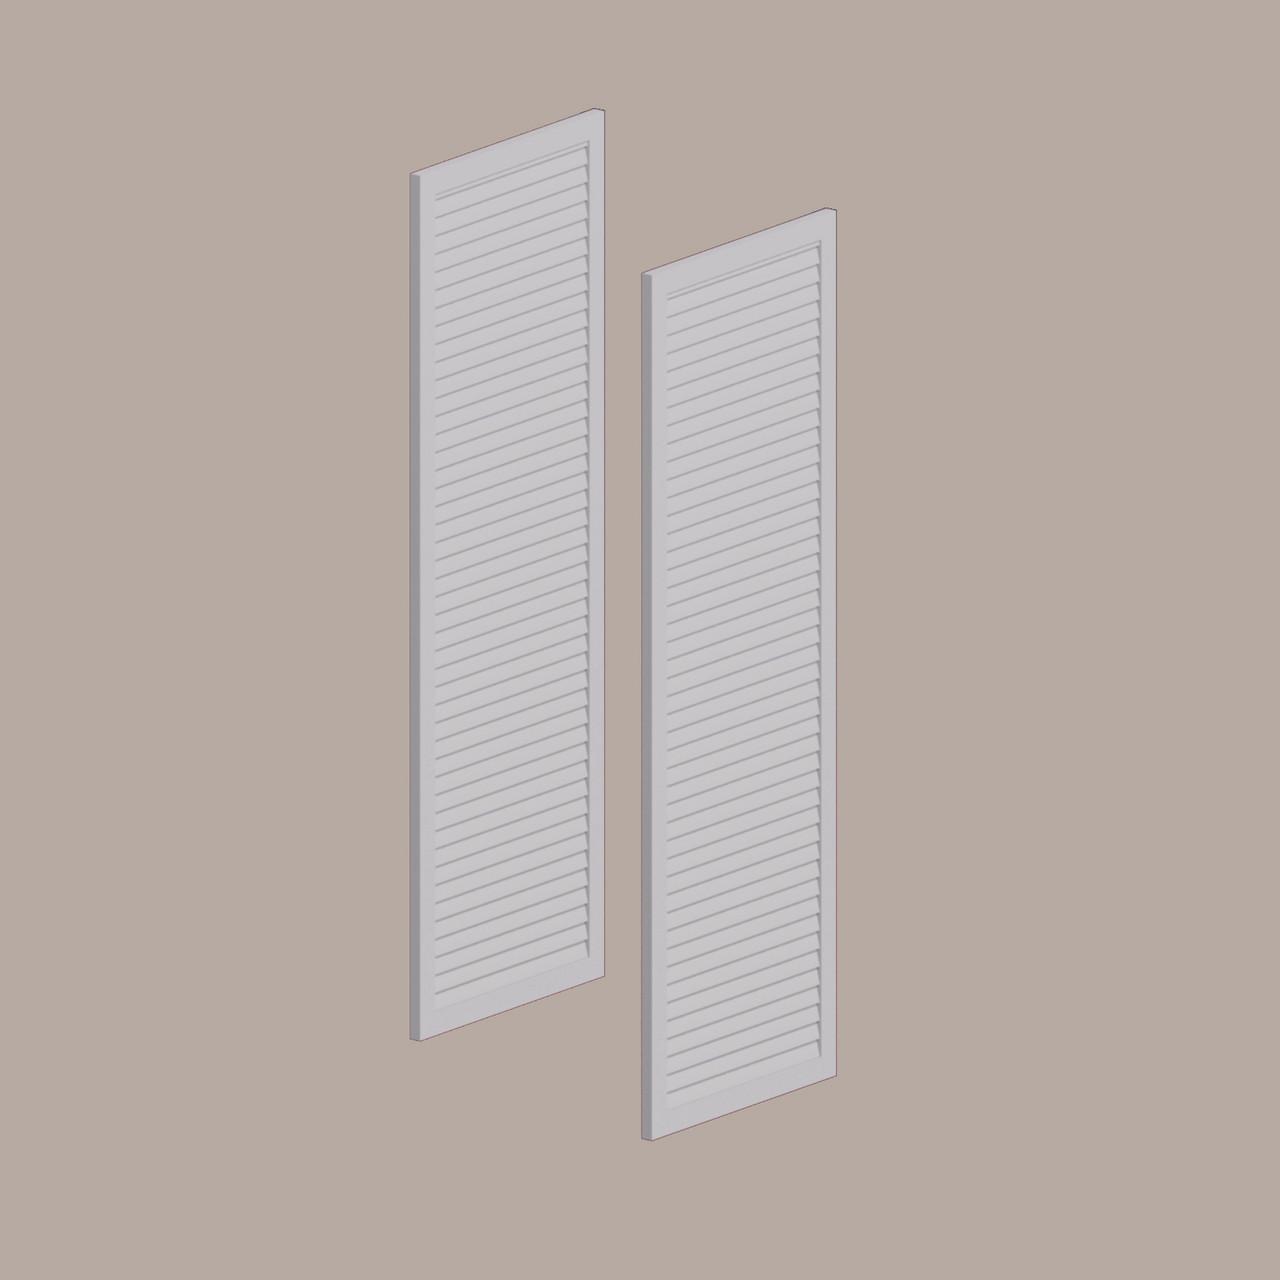 Fypon shutter___LVSH24X54FNB___LOUVERED SHUTTER, 24 W X 54 H X 1 P FINE SLATS